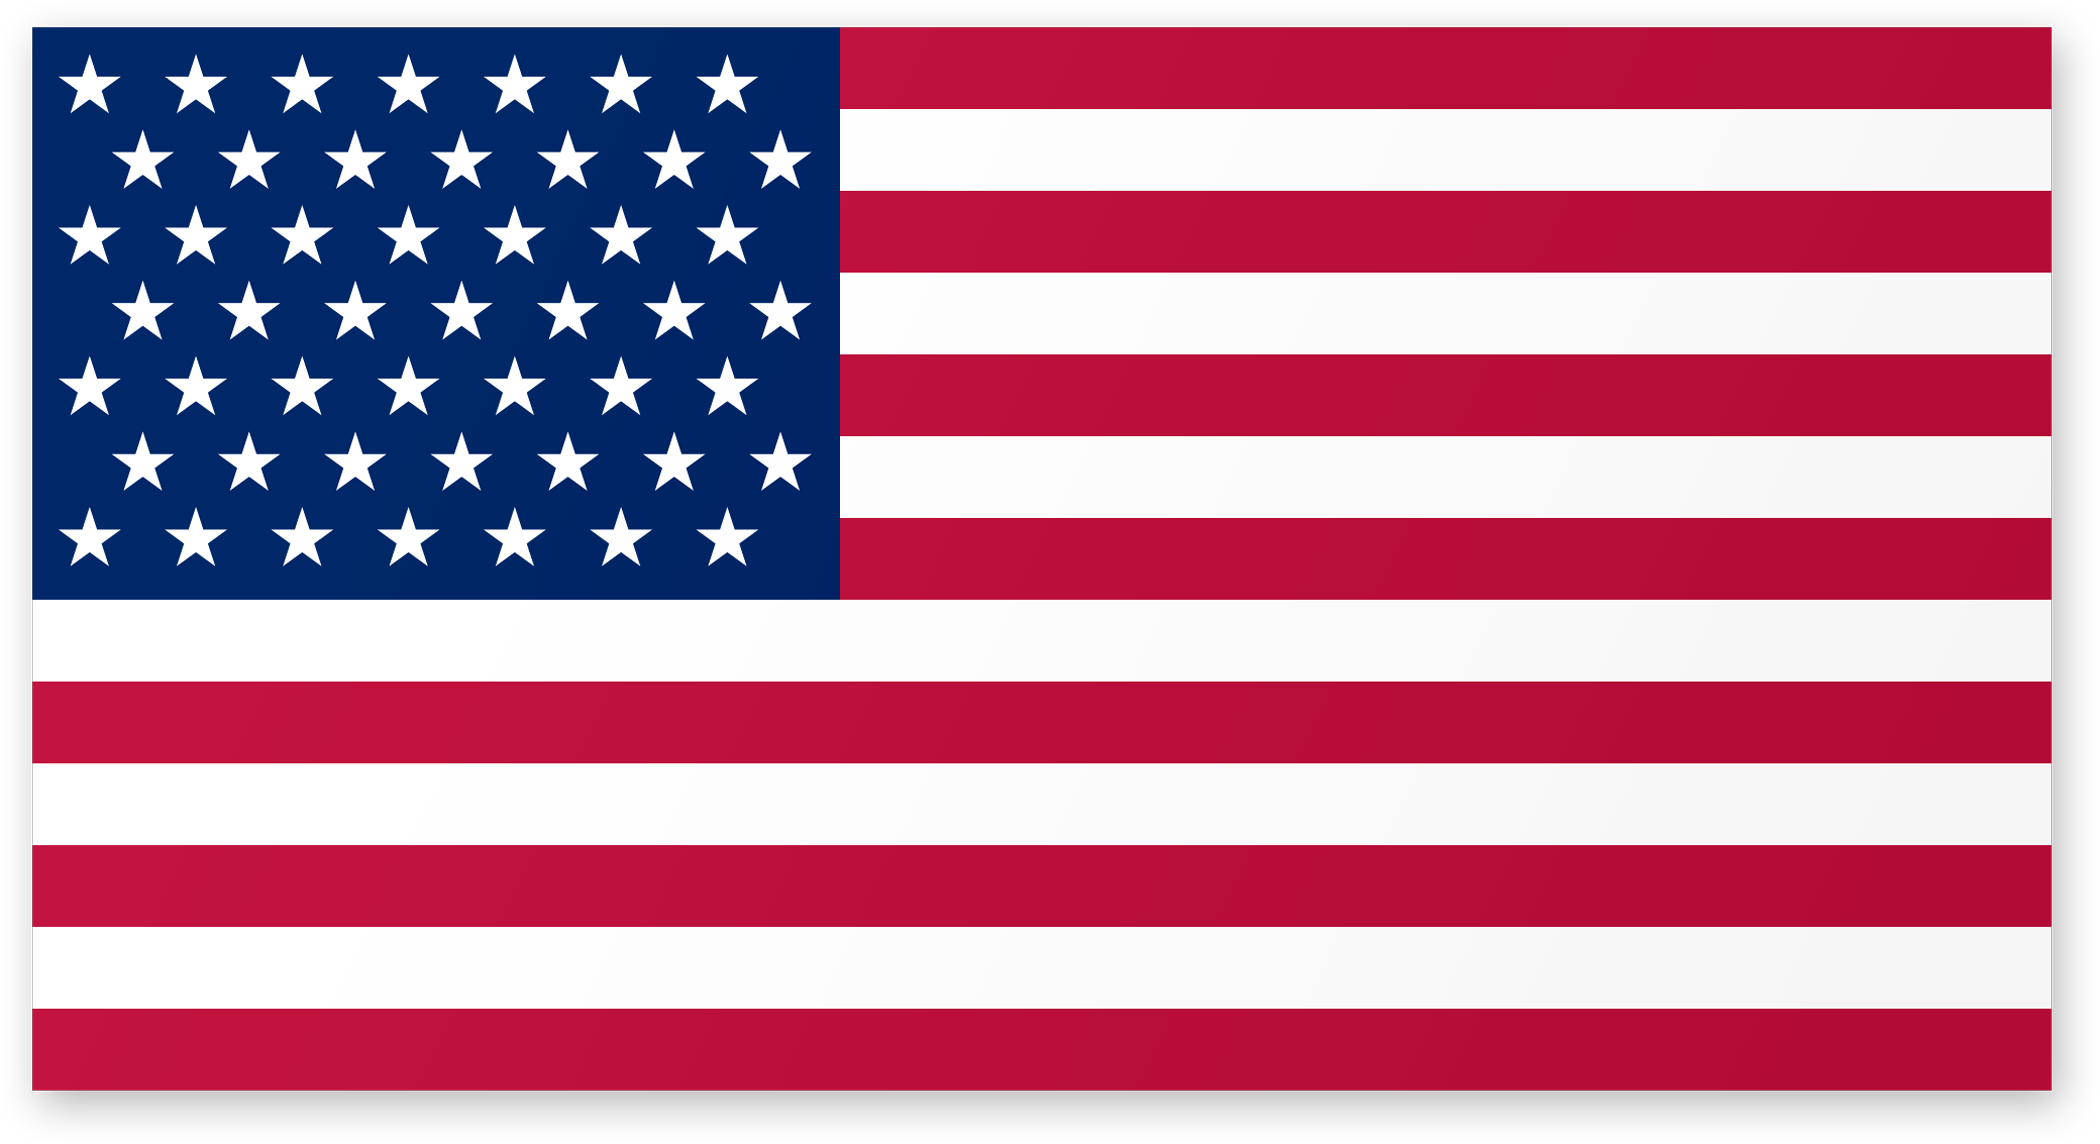 American Flag PNG Transparent - 164427